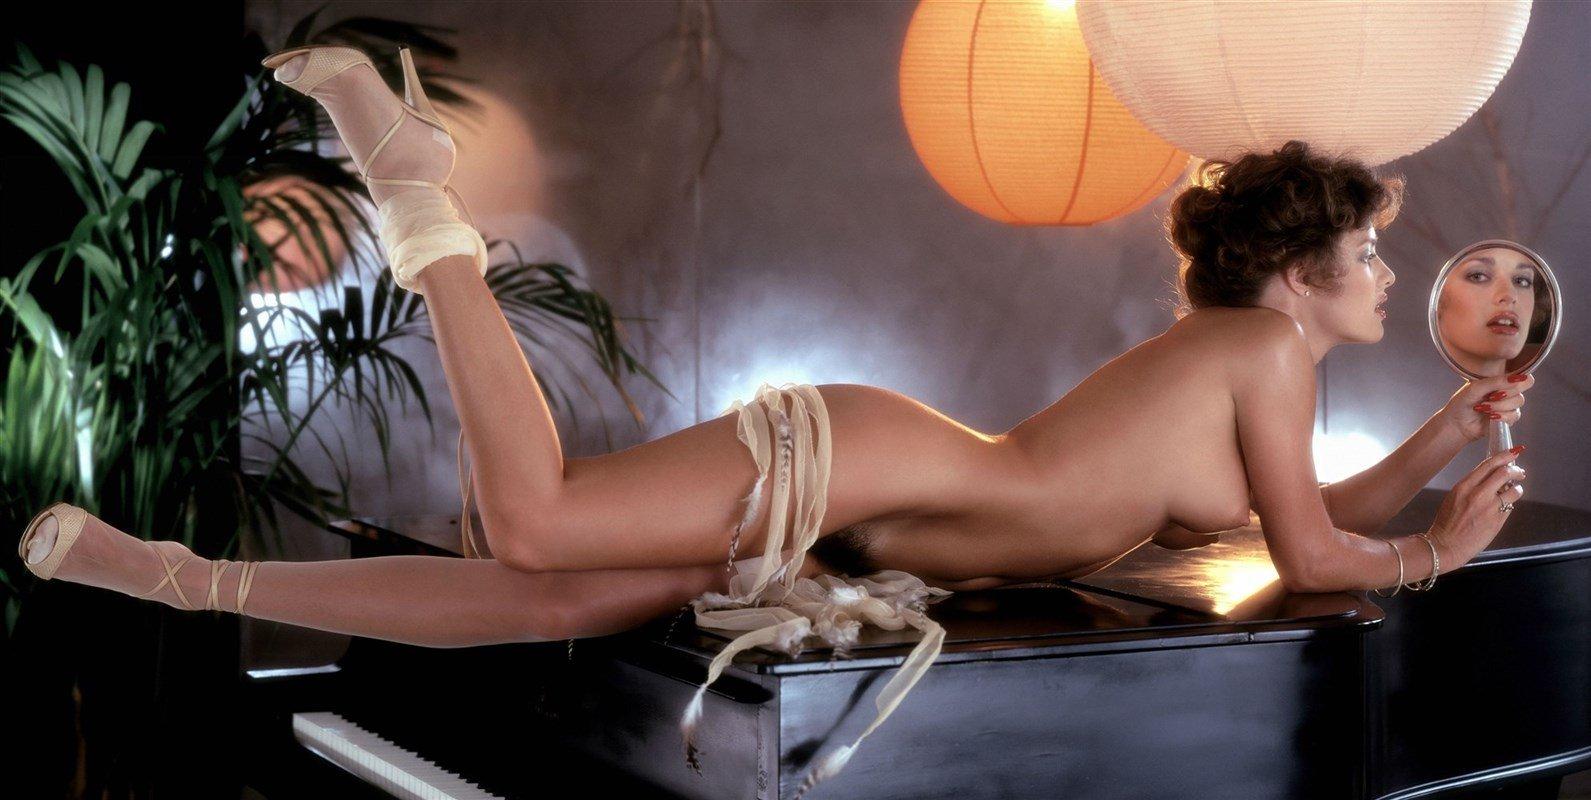 Nude Photo Of Arnold Schwarzenegger